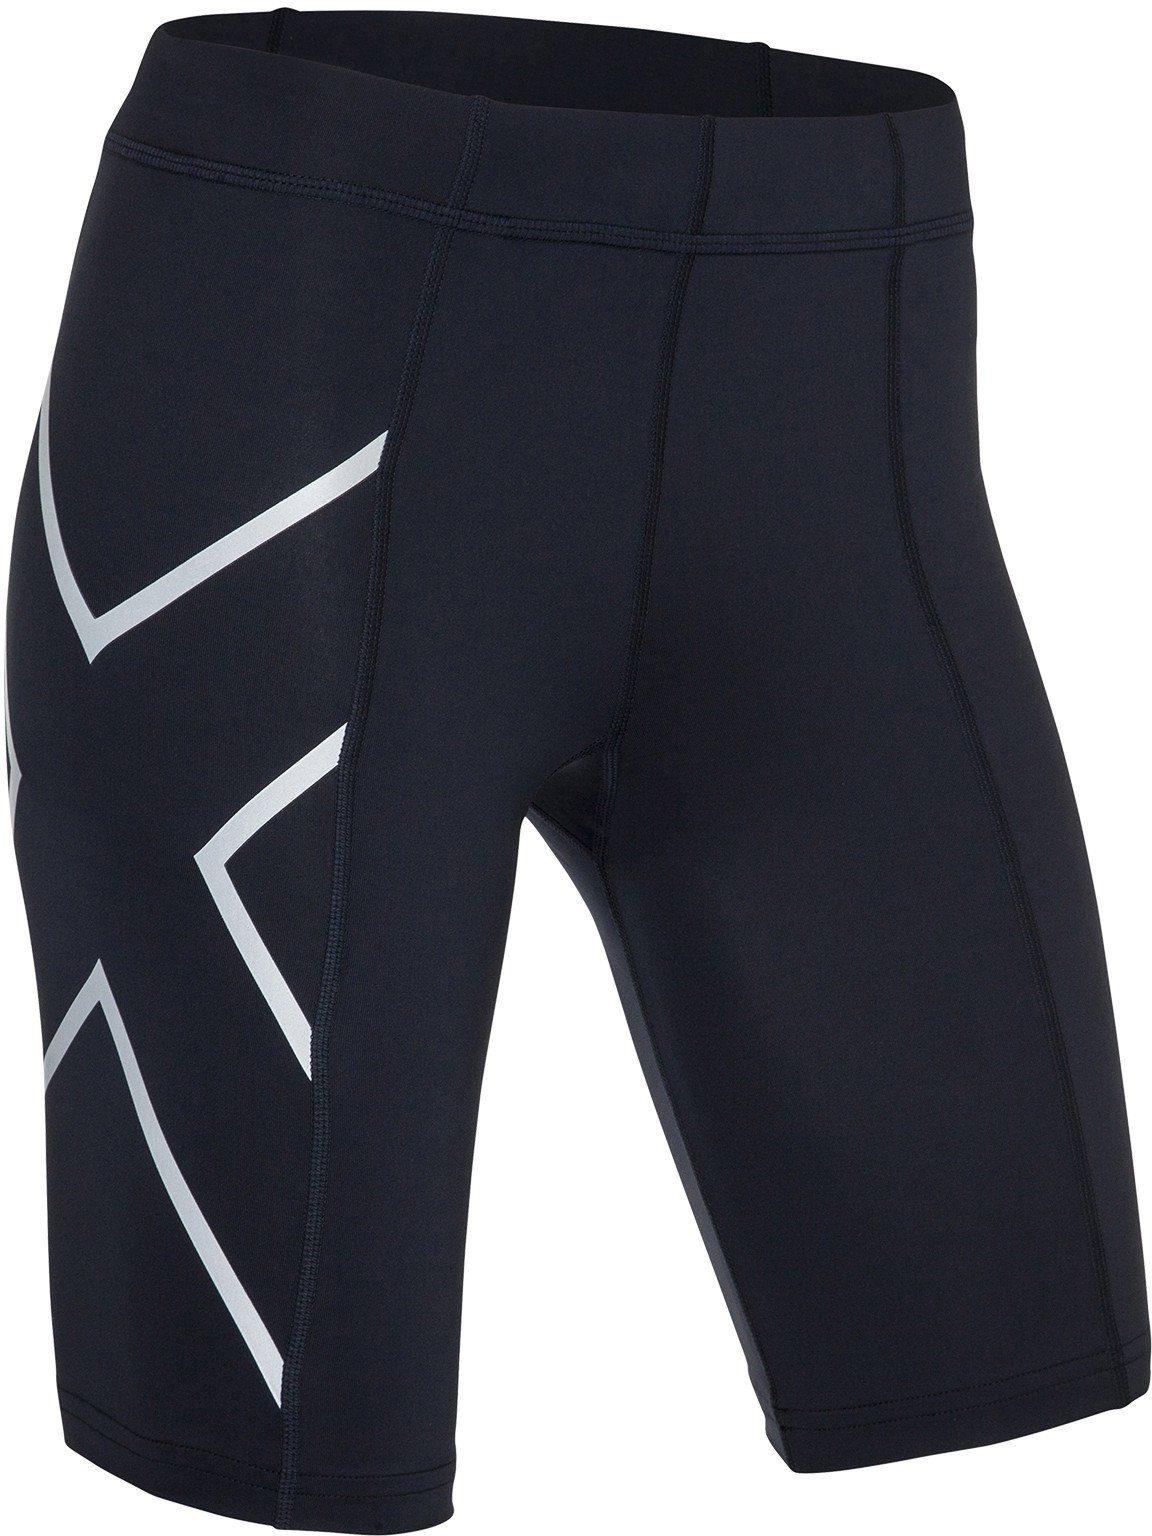 2Xu Mid-Rise Damen Kompression Shorts Funktionshose Sport Hose Laufhose Schwarz